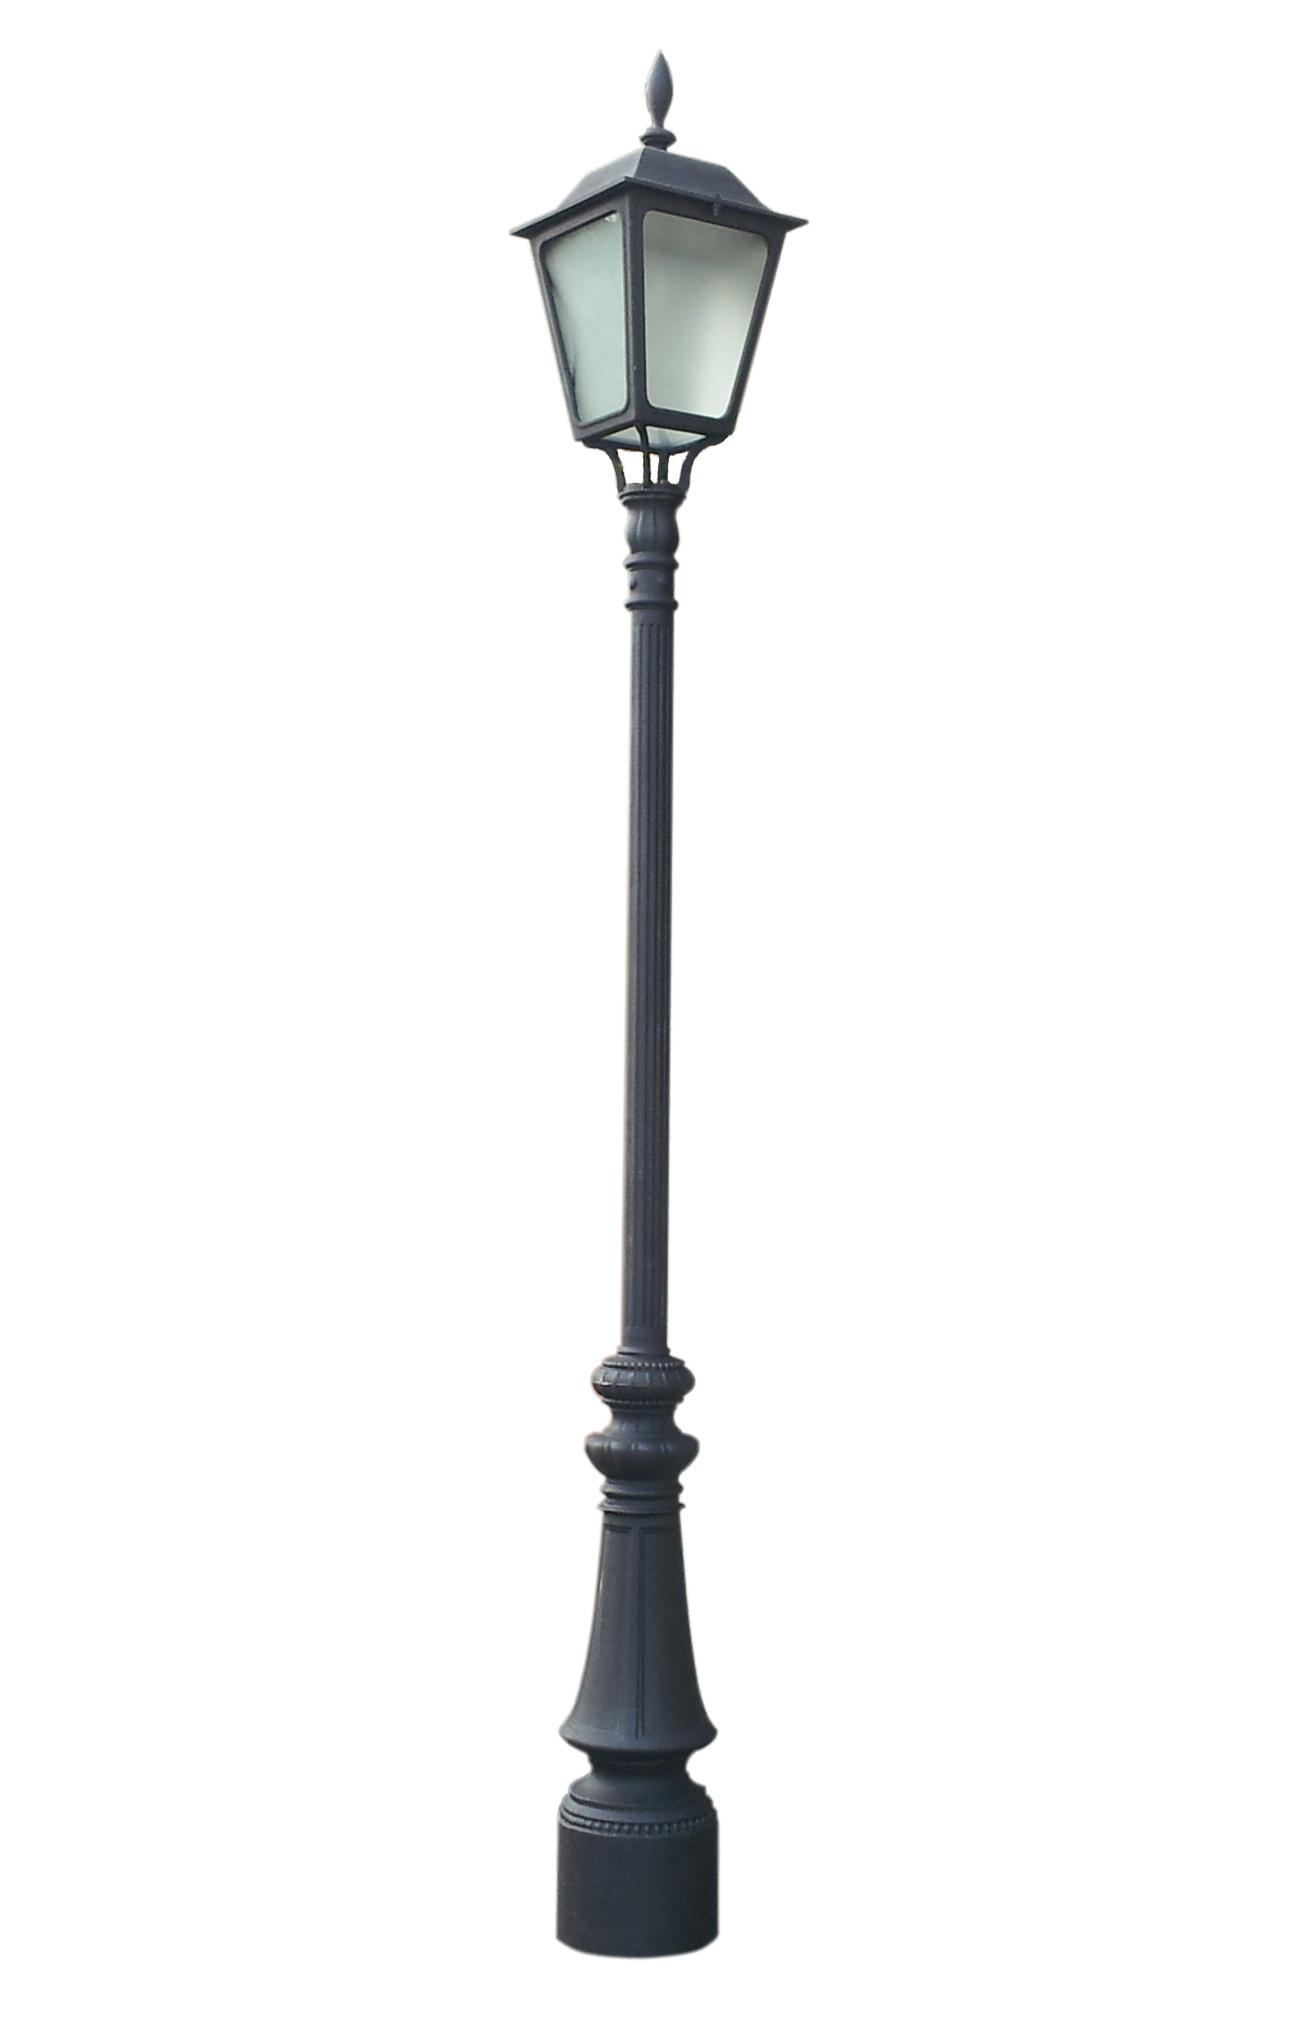 Stalpi ornamentali pentru iluminat stradal, parcuri, gradini BRAMAL LIGHT - Poza 3